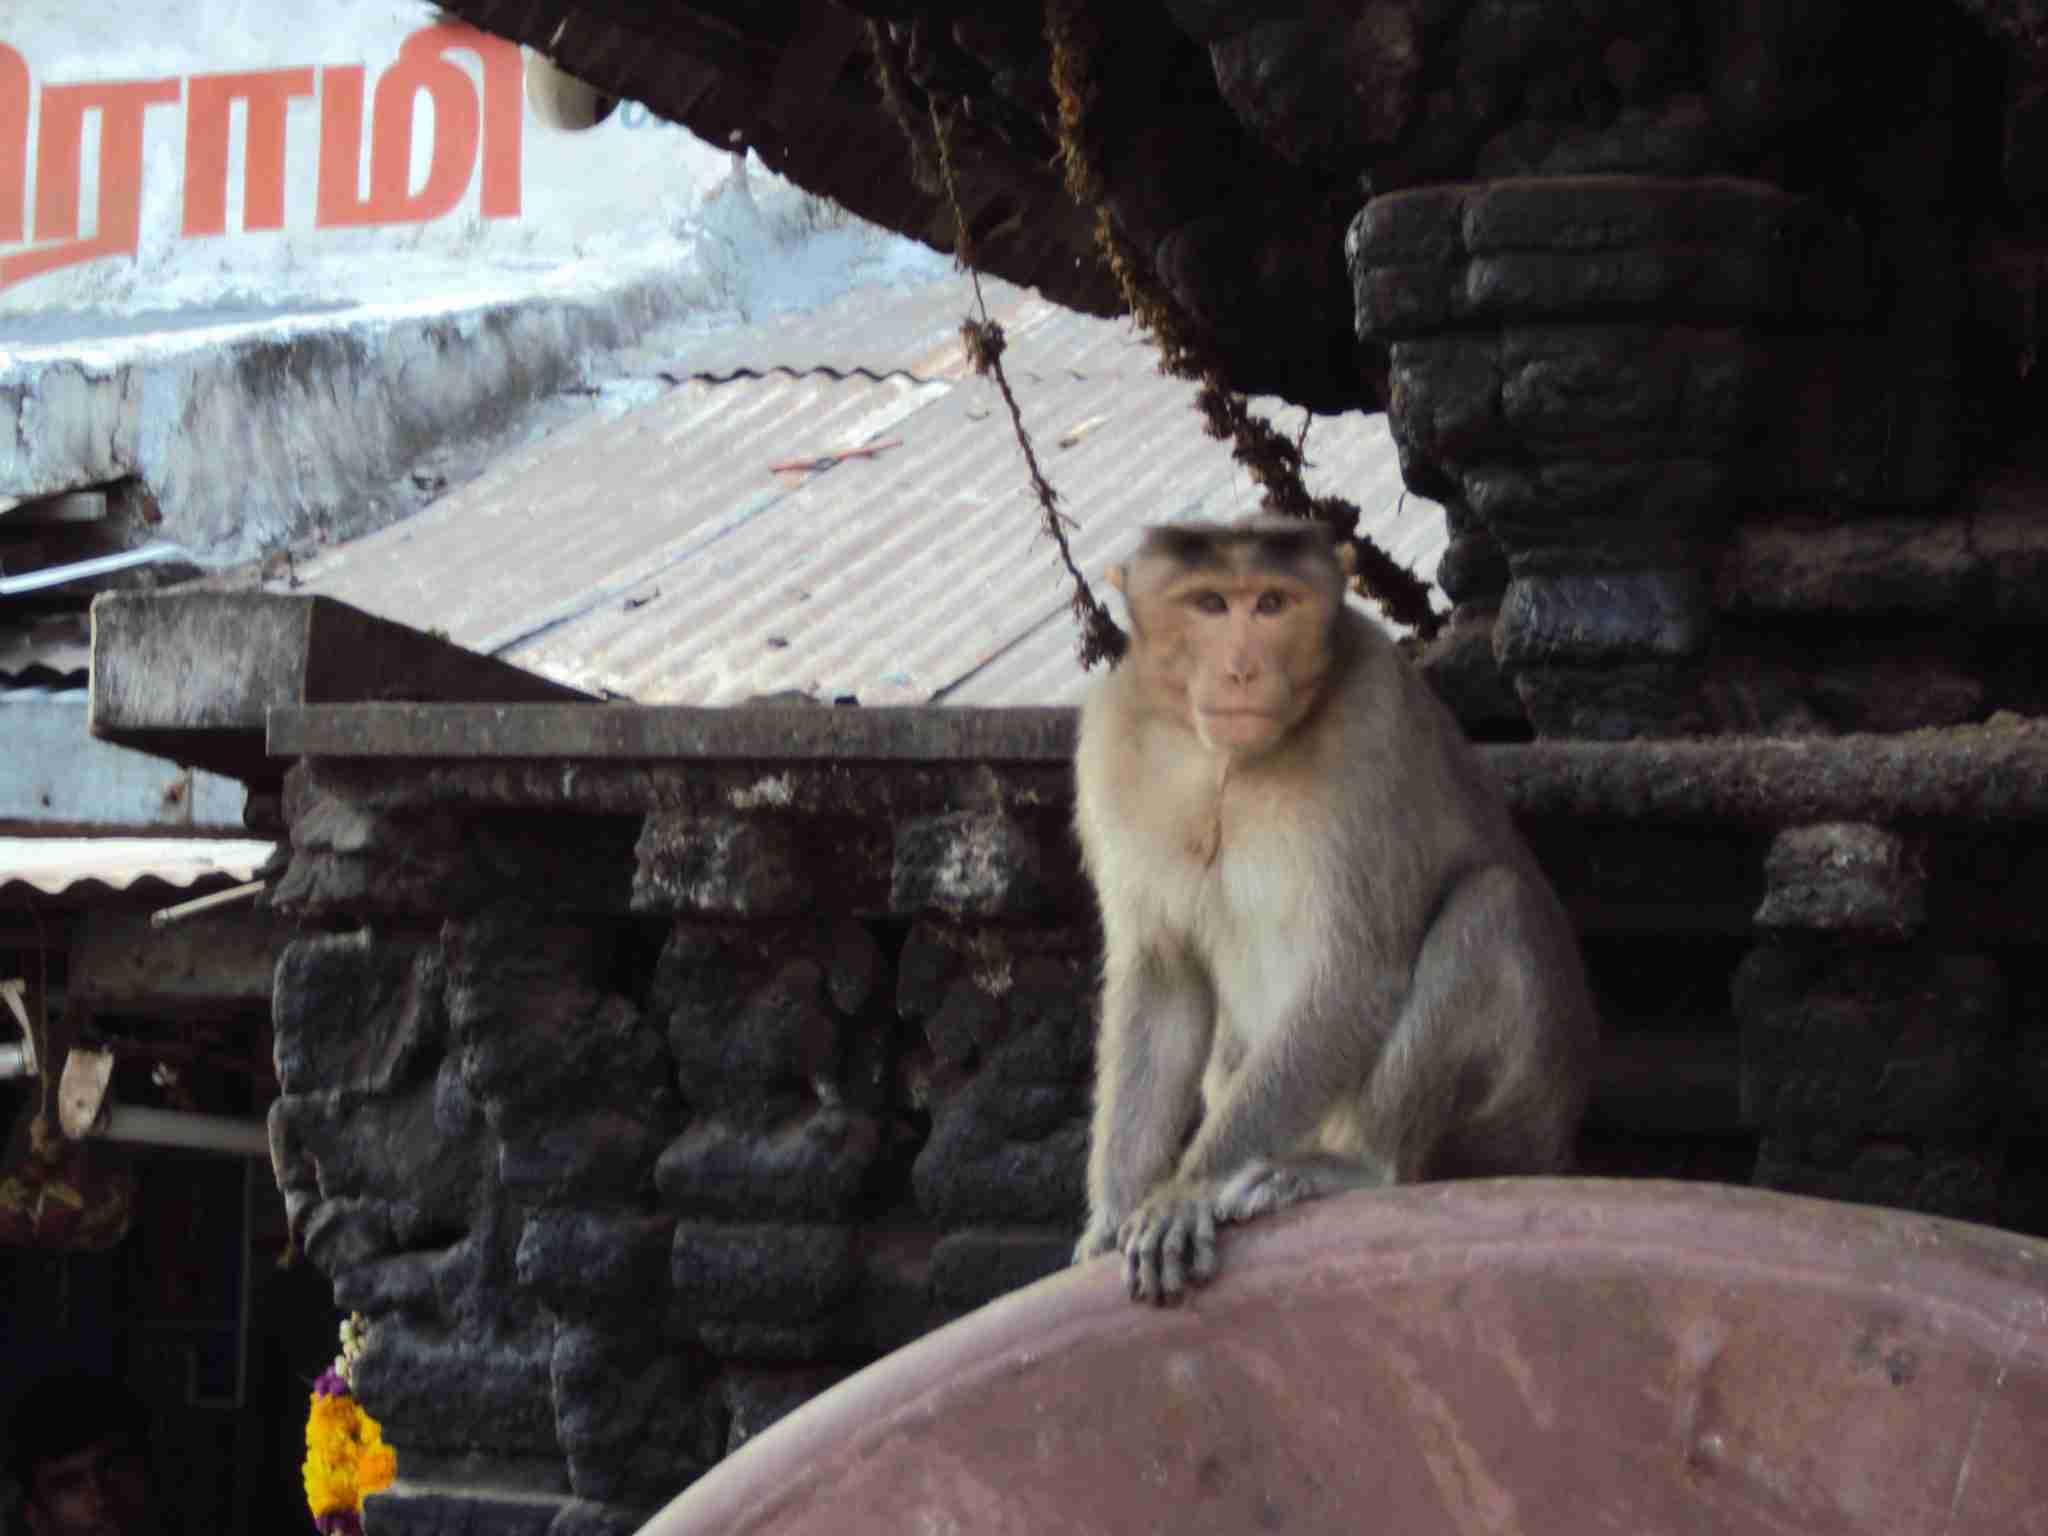 Even the monkeys find the strangers weird